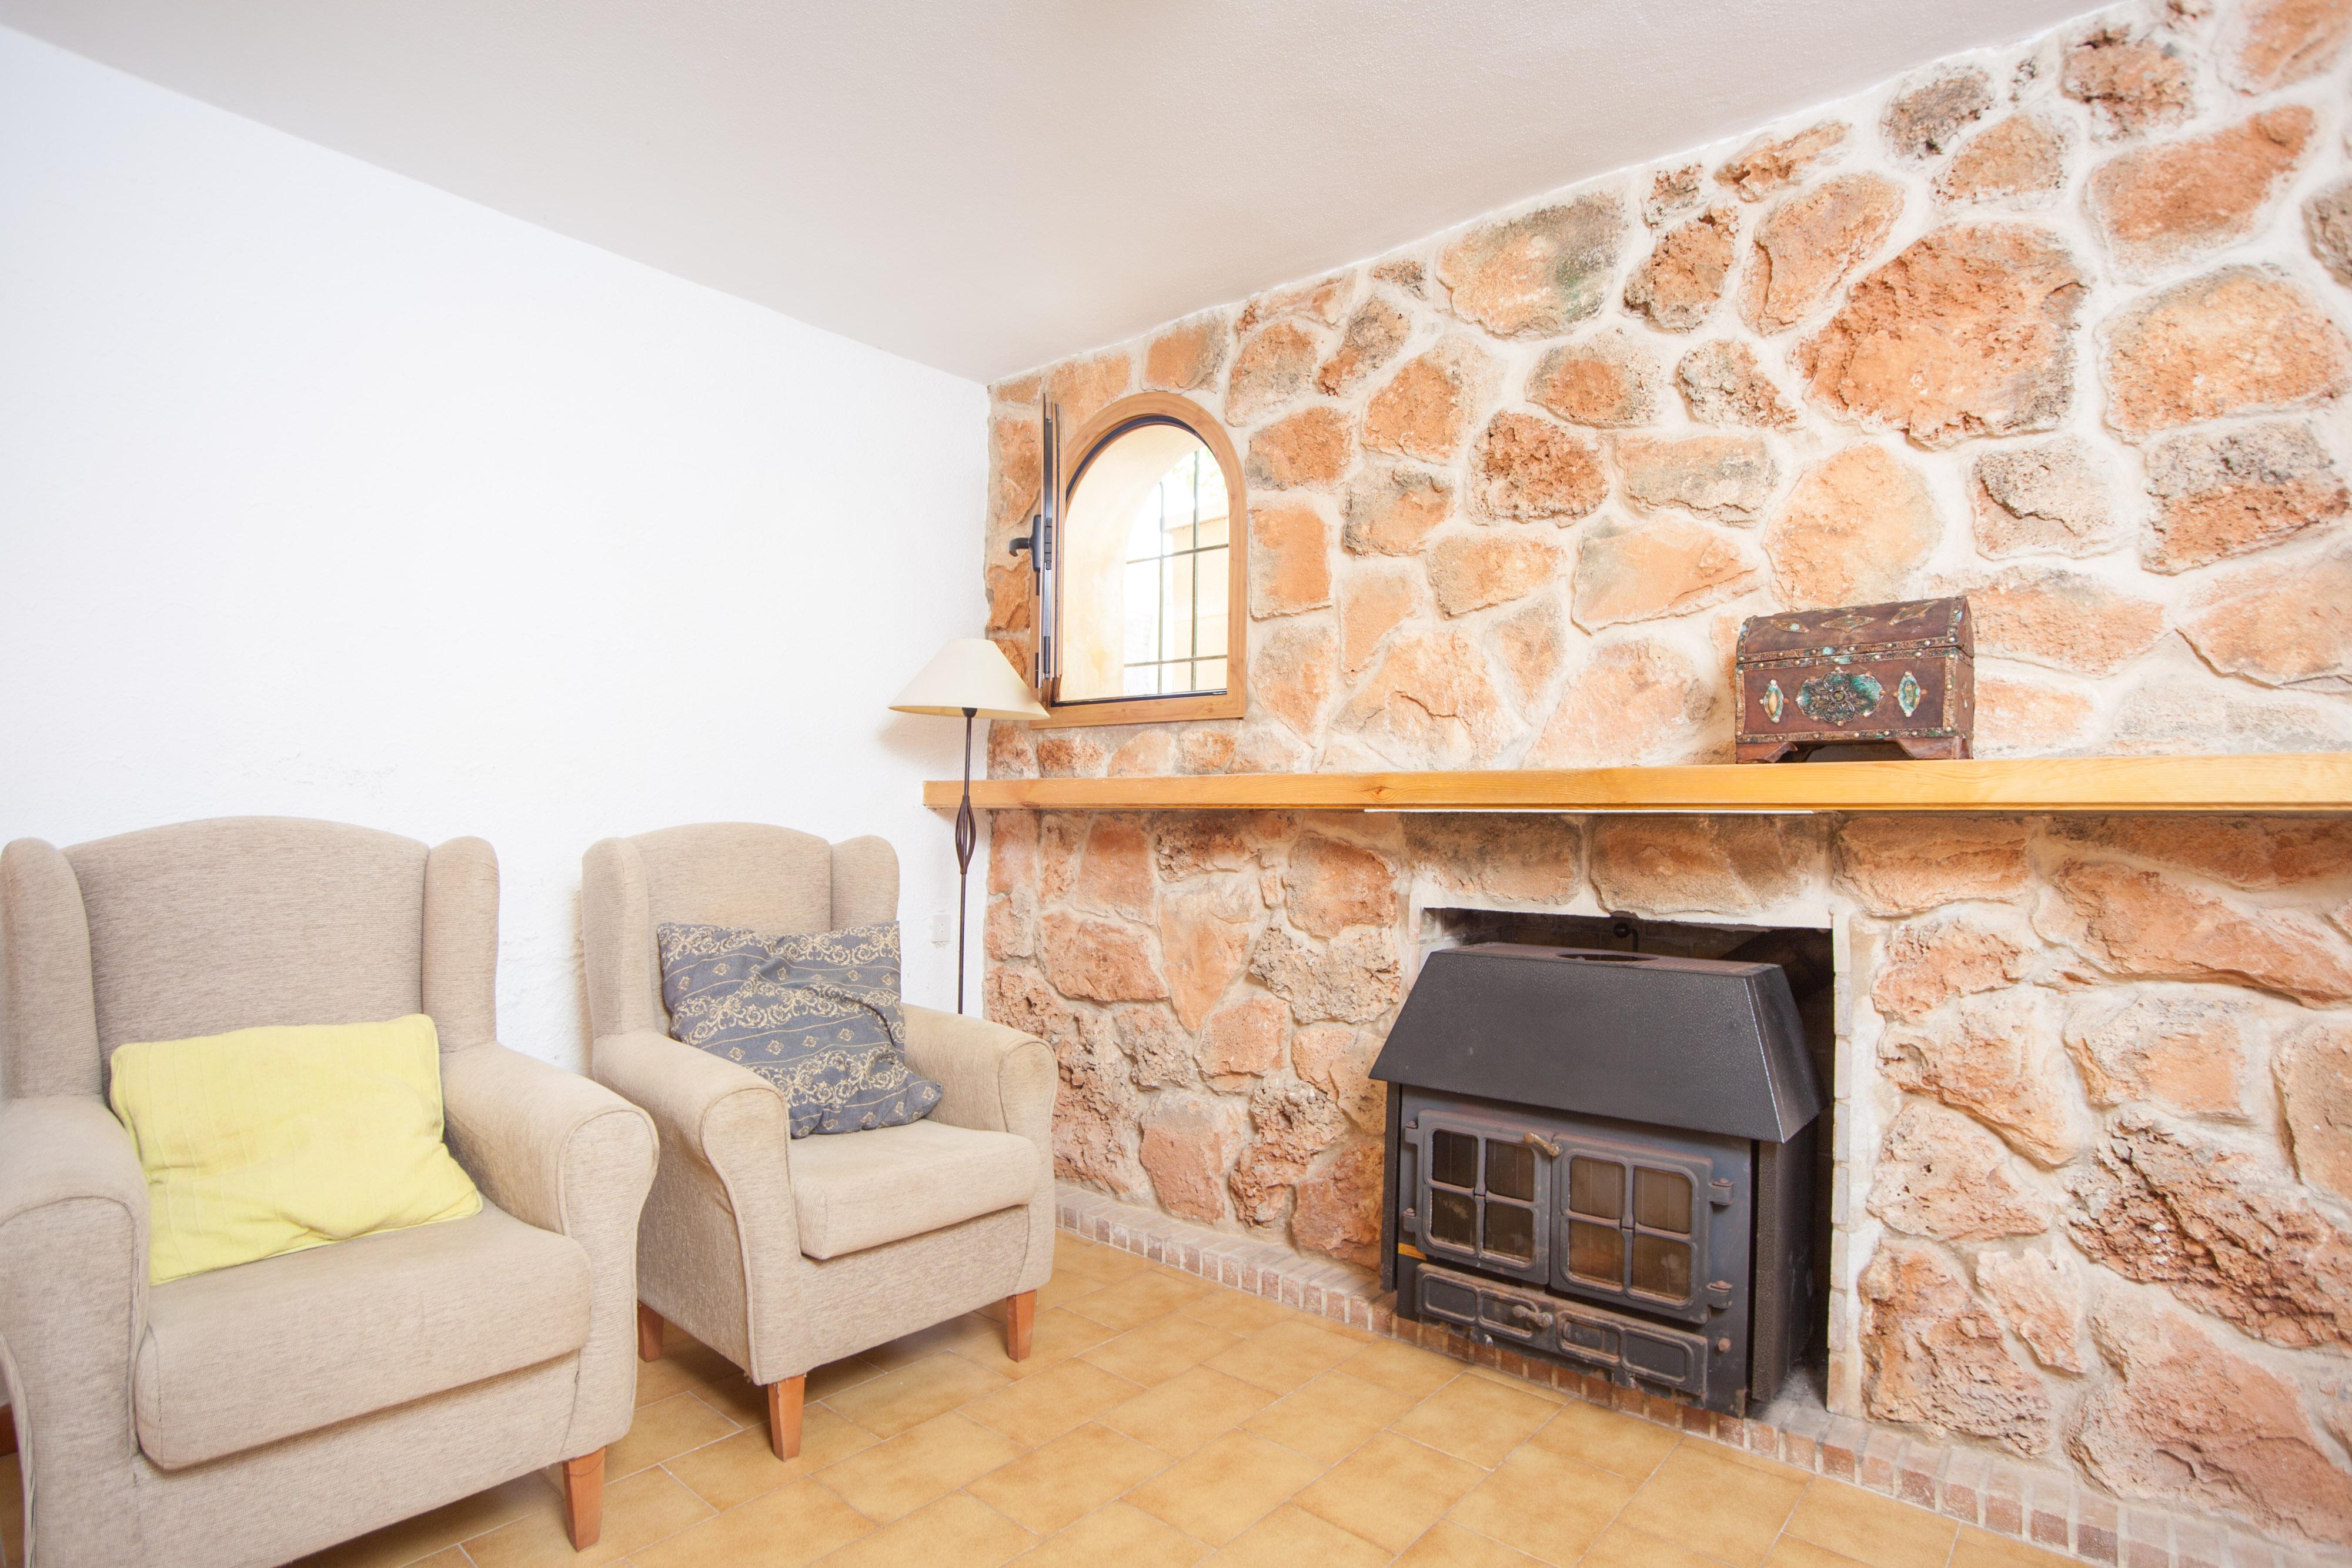 Ferienhaus CAN CUSSÓ SANSÓ (2198042), Colonia de Sant Pere, Mallorca, Balearische Inseln, Spanien, Bild 21